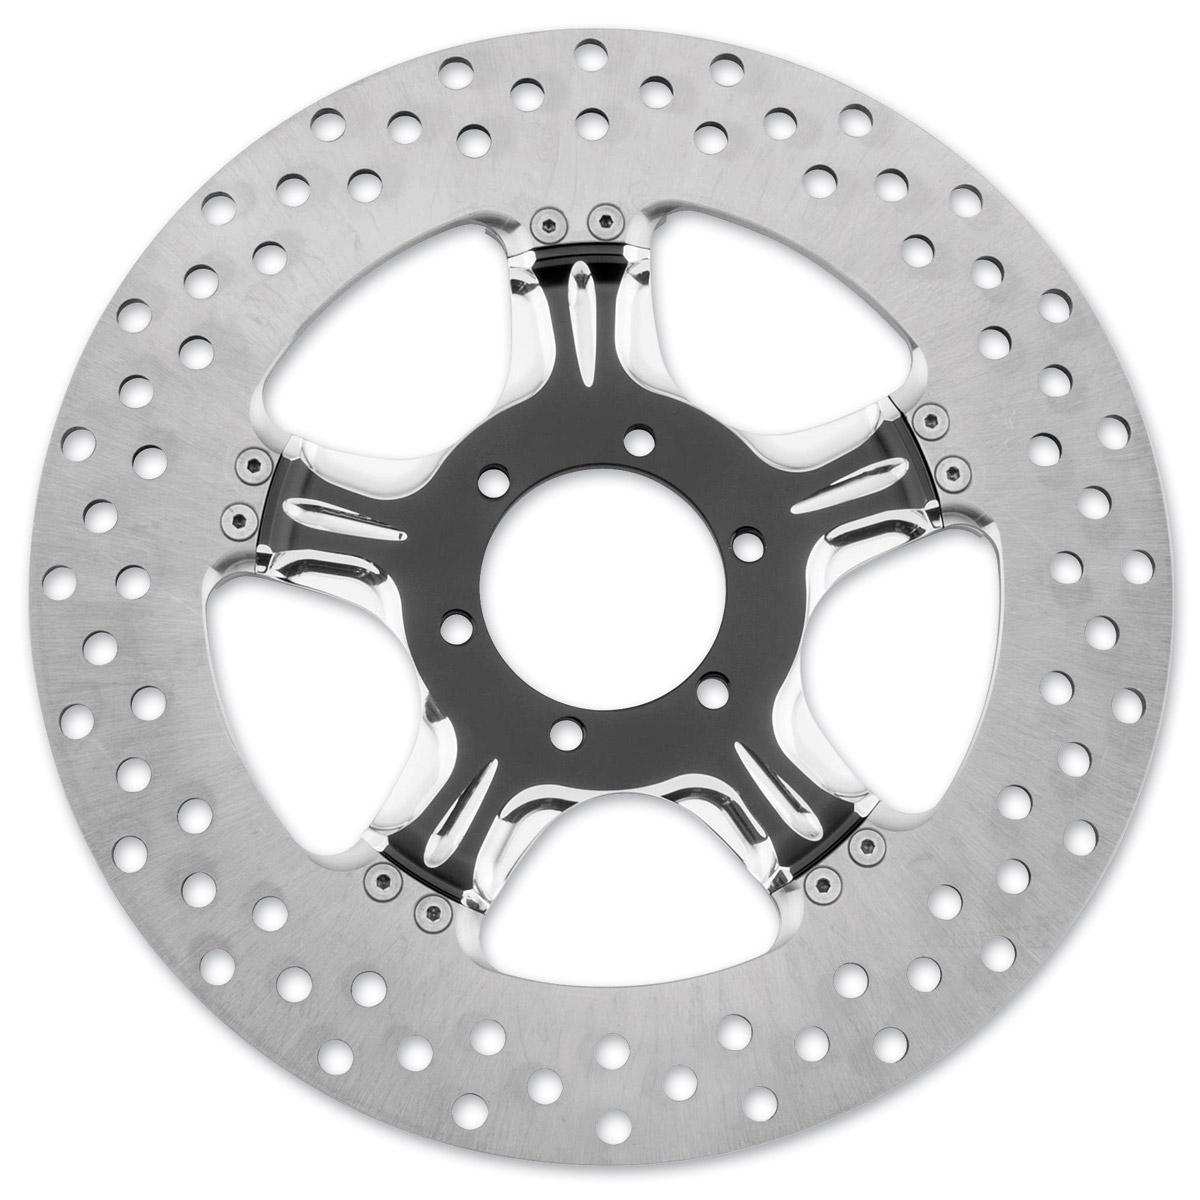 Performance Machine 11.8″ Wrath Contrast Cut Platinum Front/Rear Brake Rotor